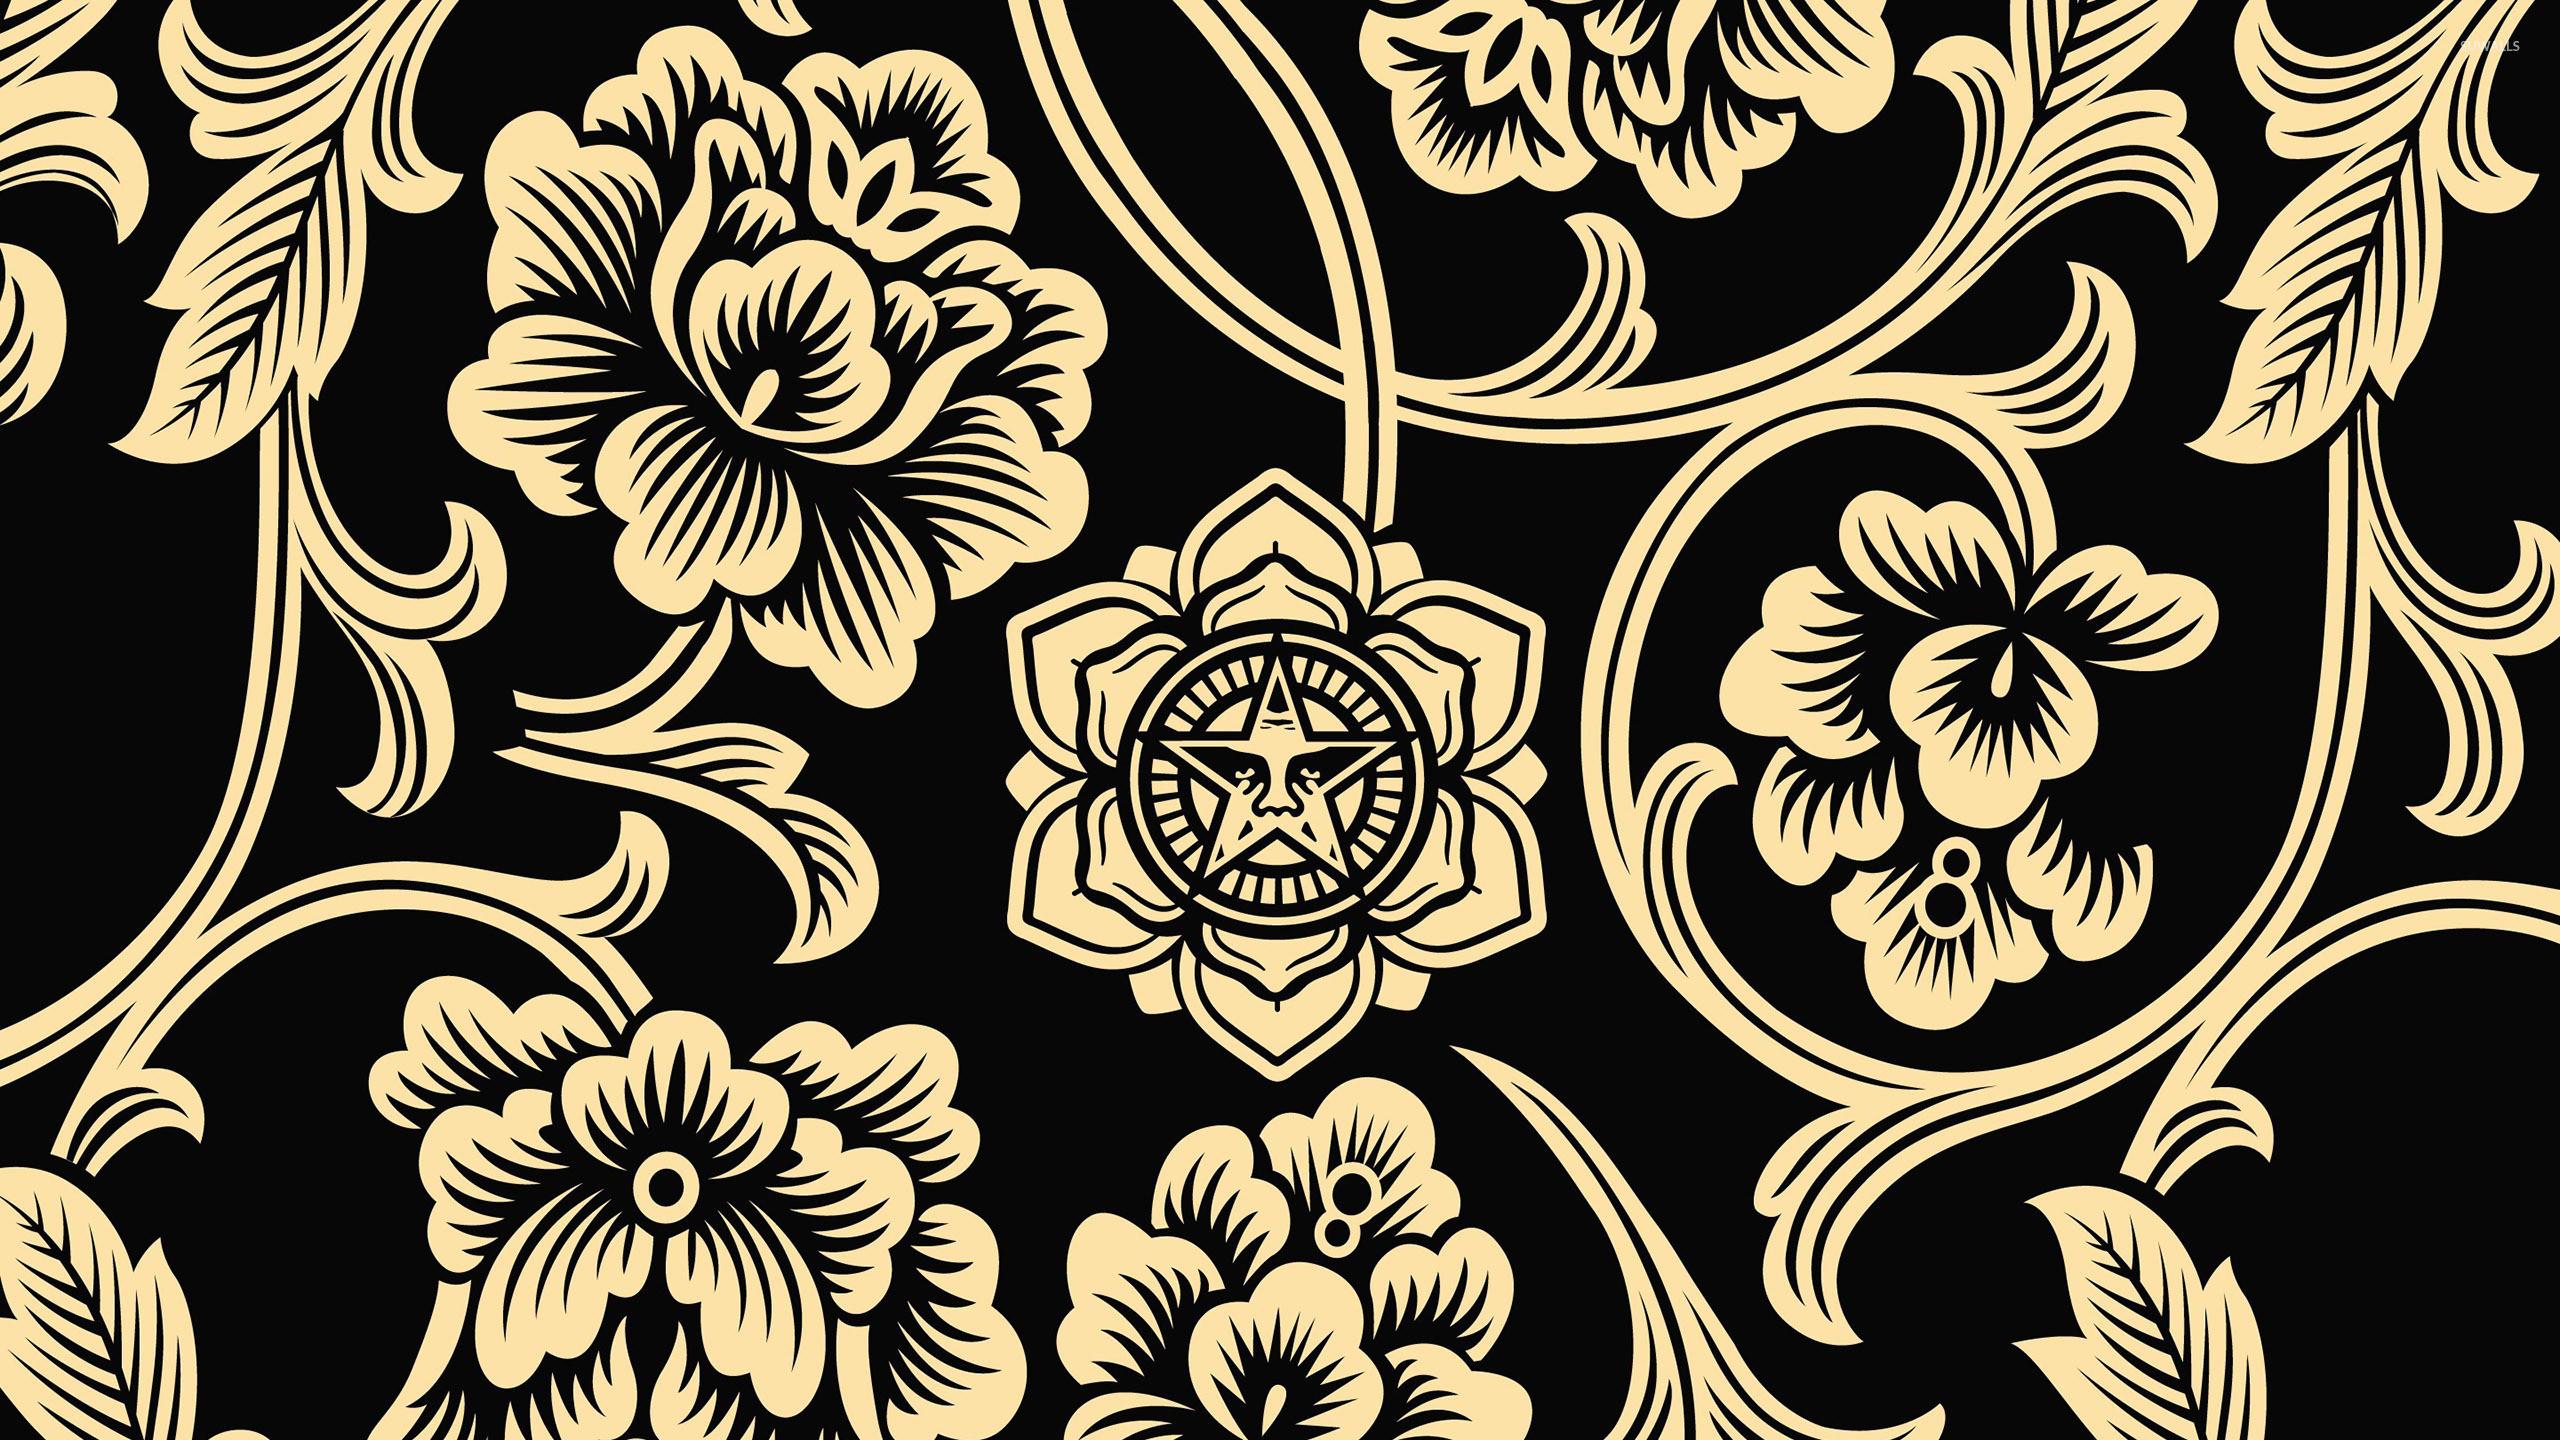 Tribal Wallpaper Designs 183 ① Wallpapertag